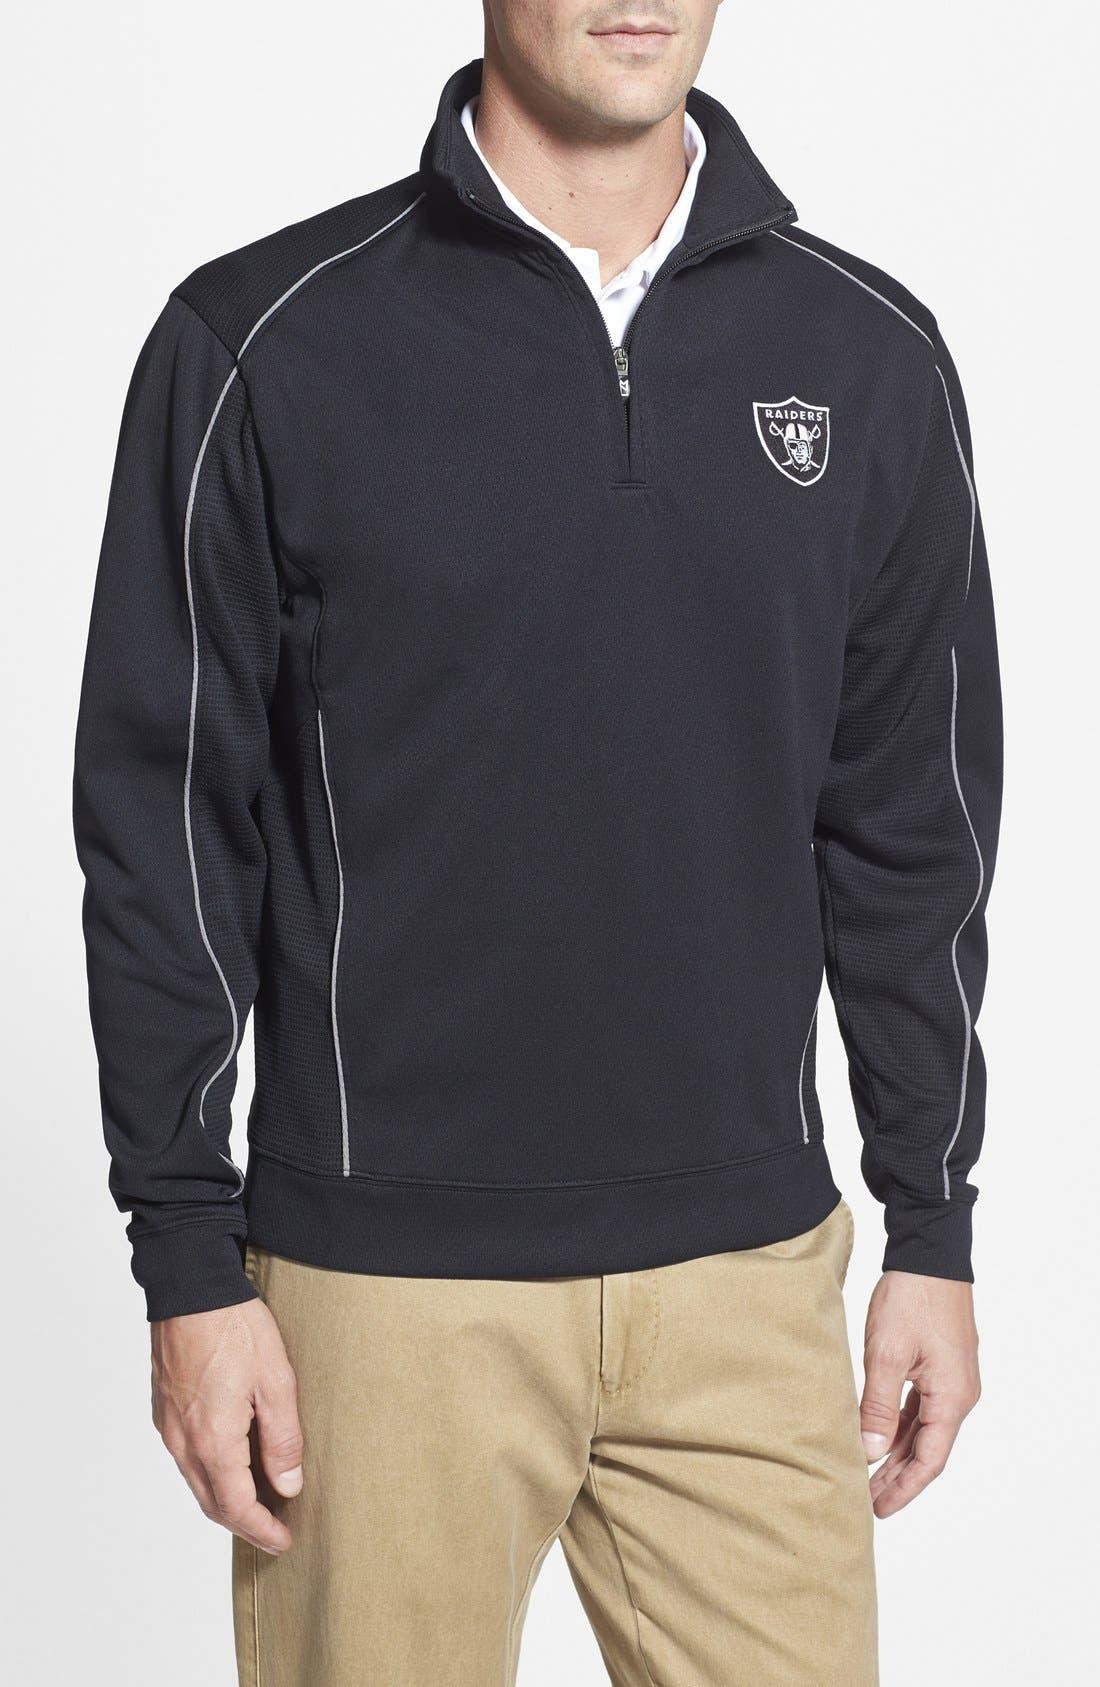 Cutter & Buck Oakland Raiders - Edge DryTec Moisture Wicking Half Zip Pullover